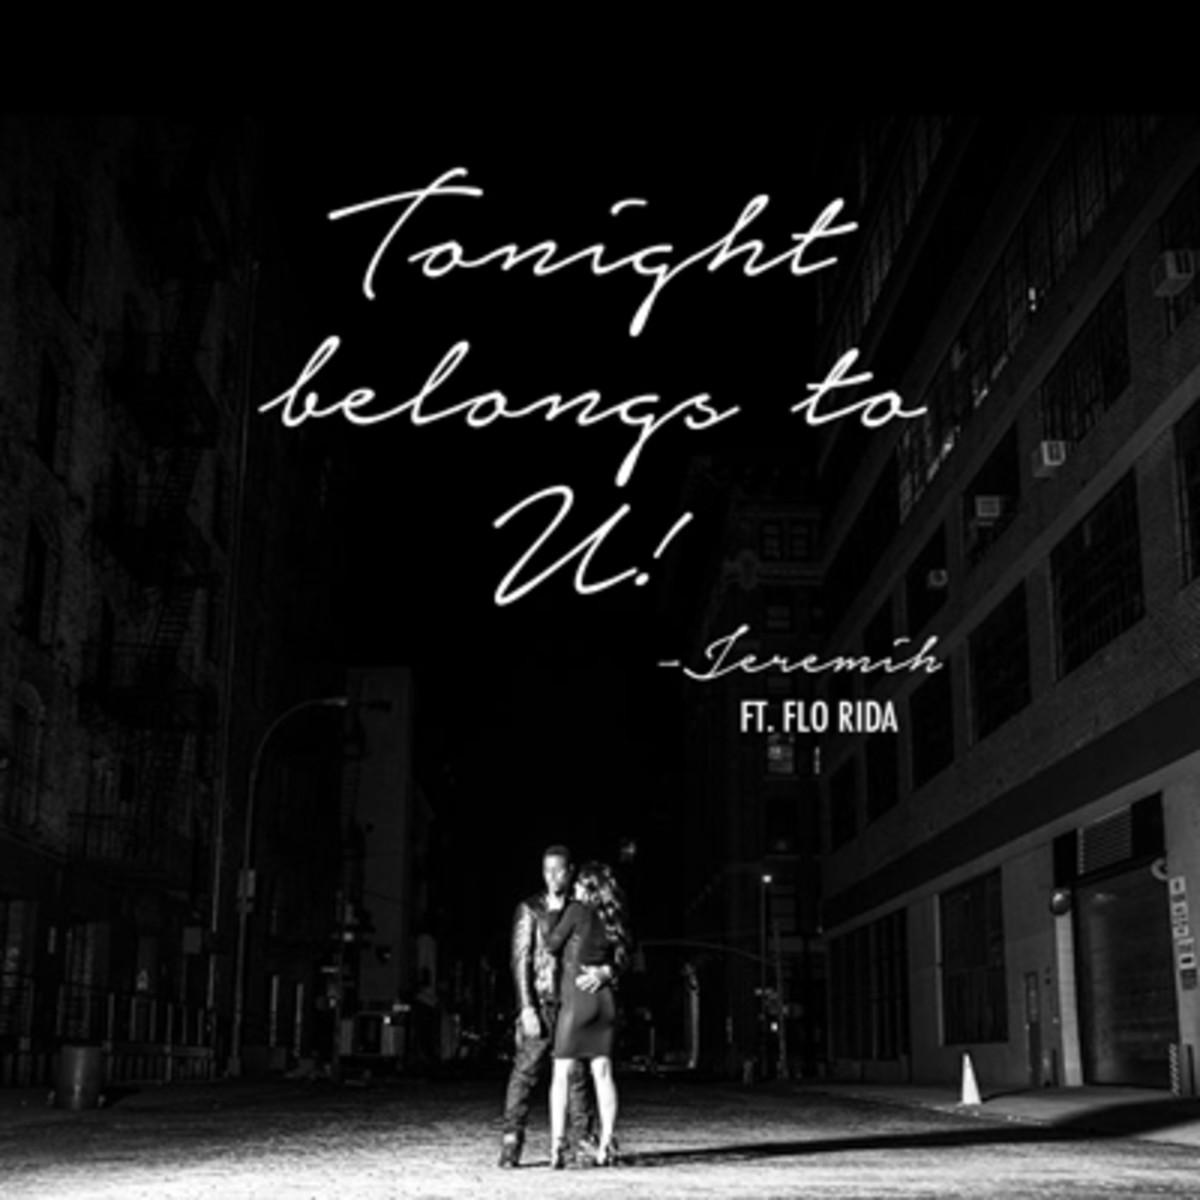 jeremih-tonight-belongs-to-you.jpg